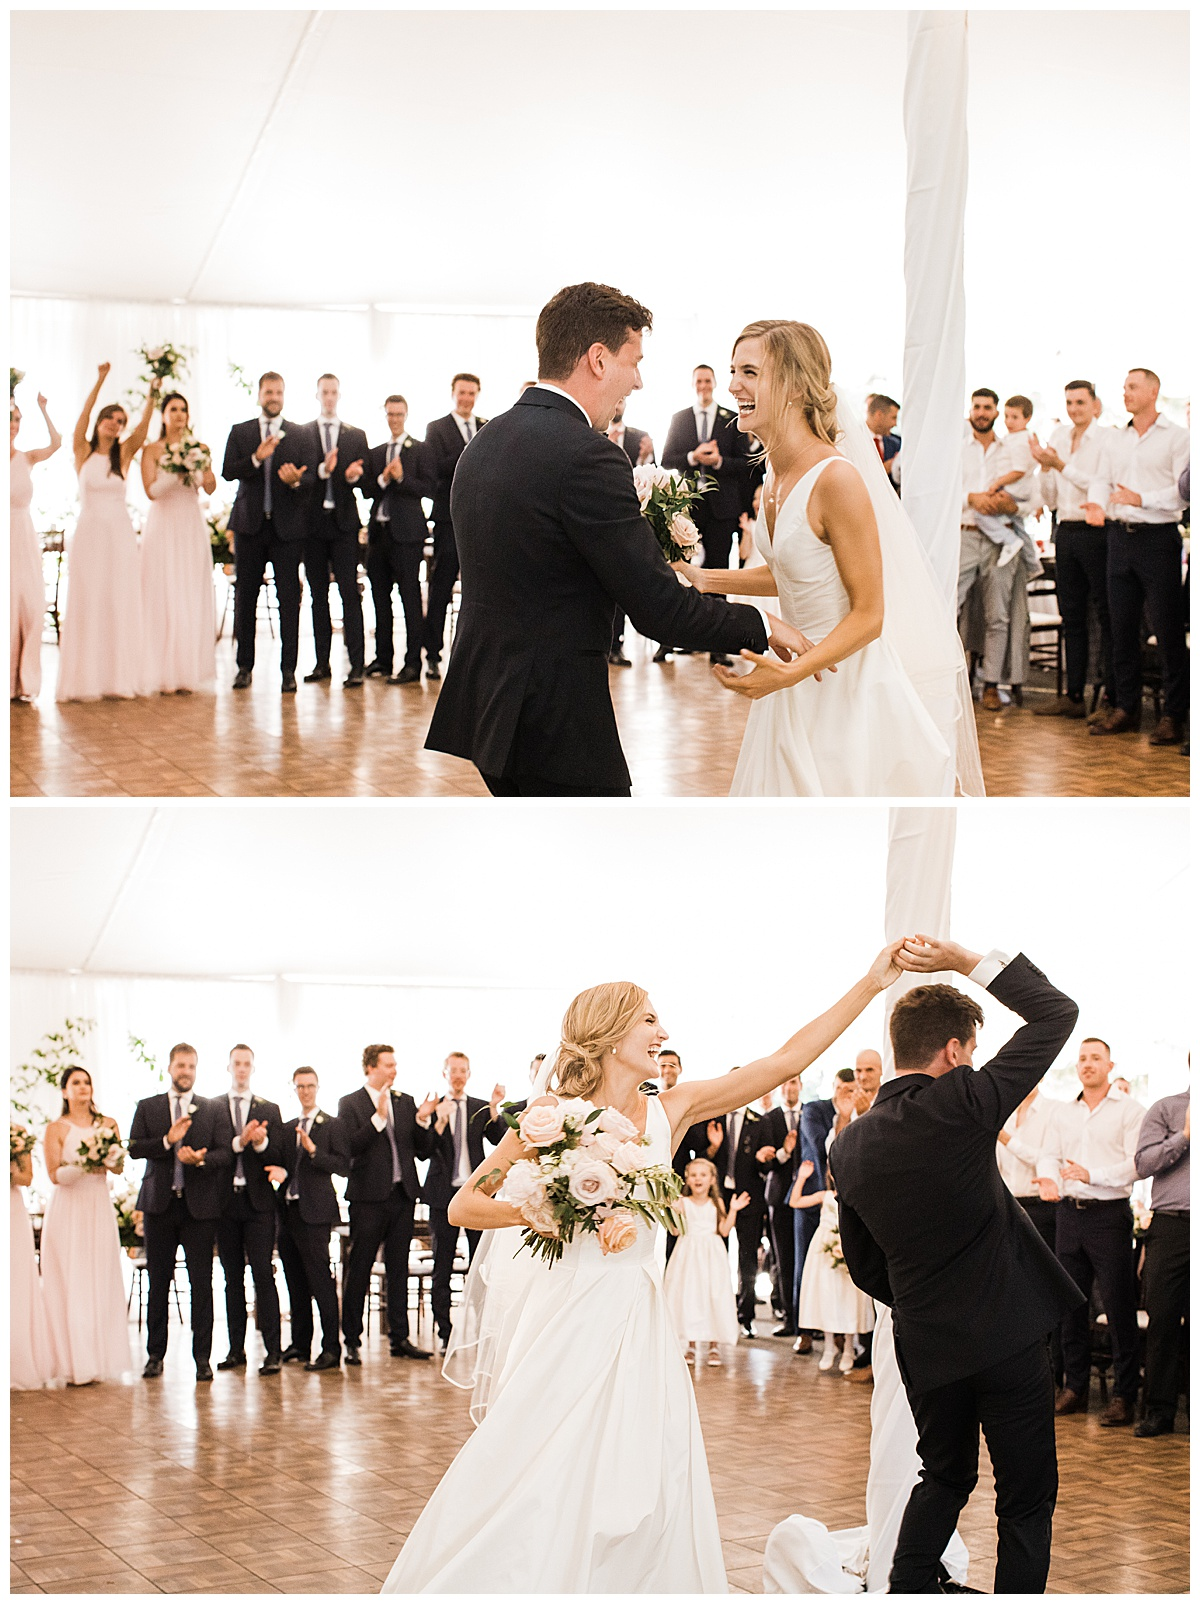 Bride and groom laughing and dancing  Ontario wedding  Toronto wedding photographer  3photography